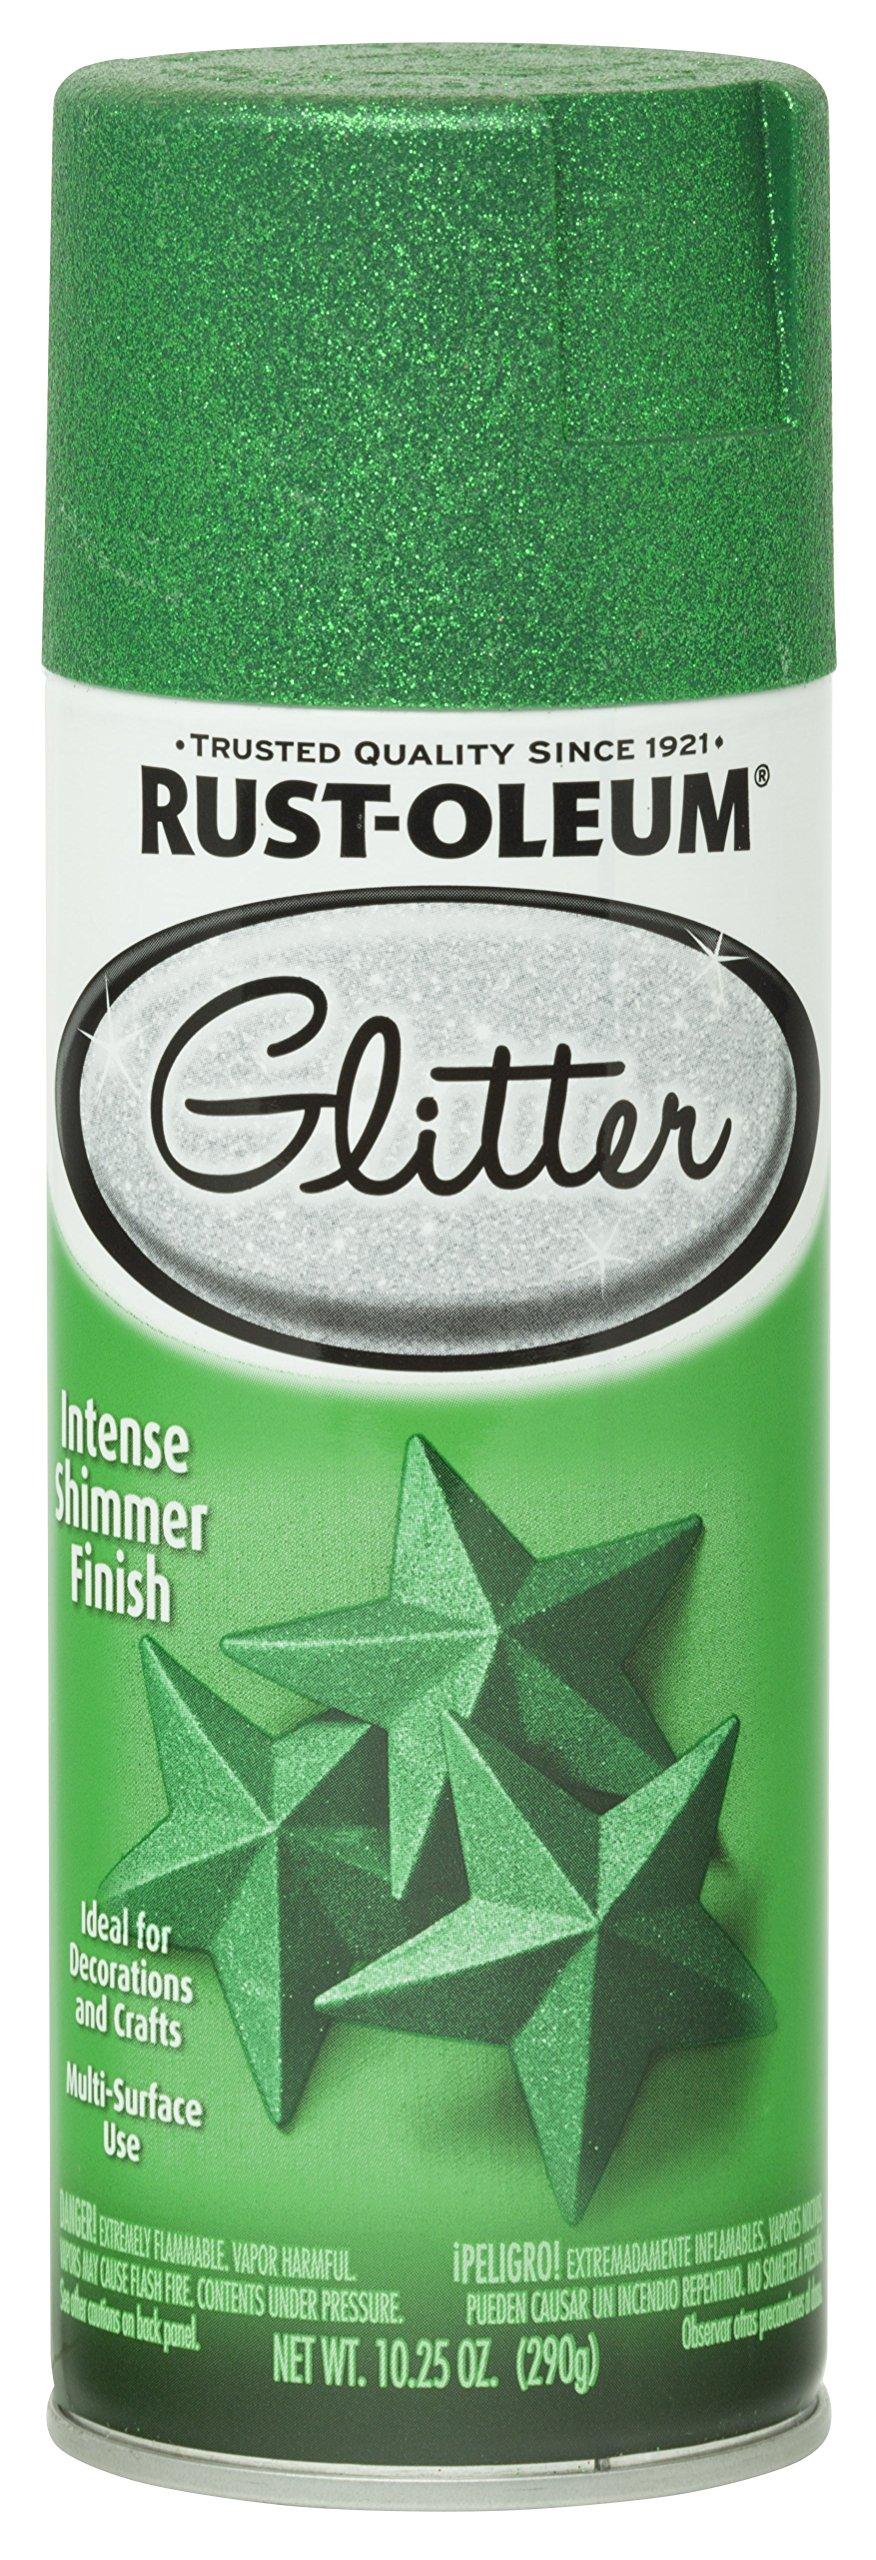 Rust-Oleum 277781 Specialty Spray Paint, Each, Kelly Green Glitter